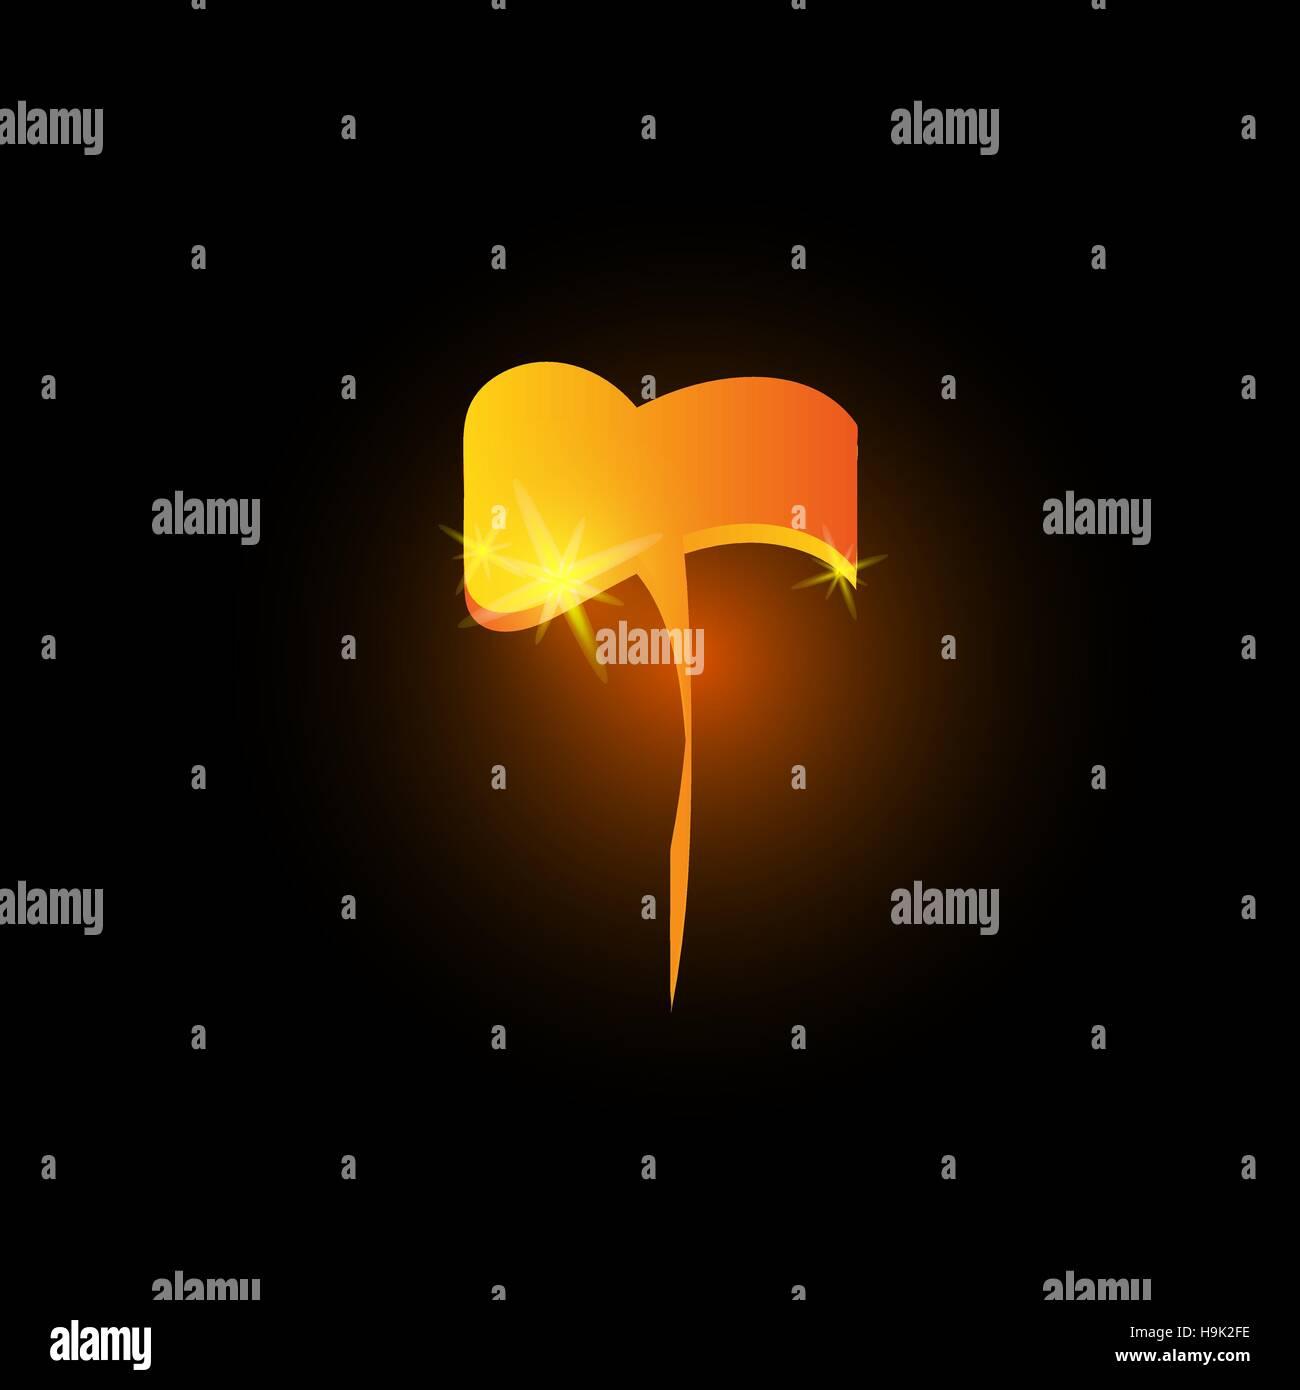 Golden arabic style letter t. Shiny latin alphabet element icon on black background. Oriental calligraphy design. - Stock Image